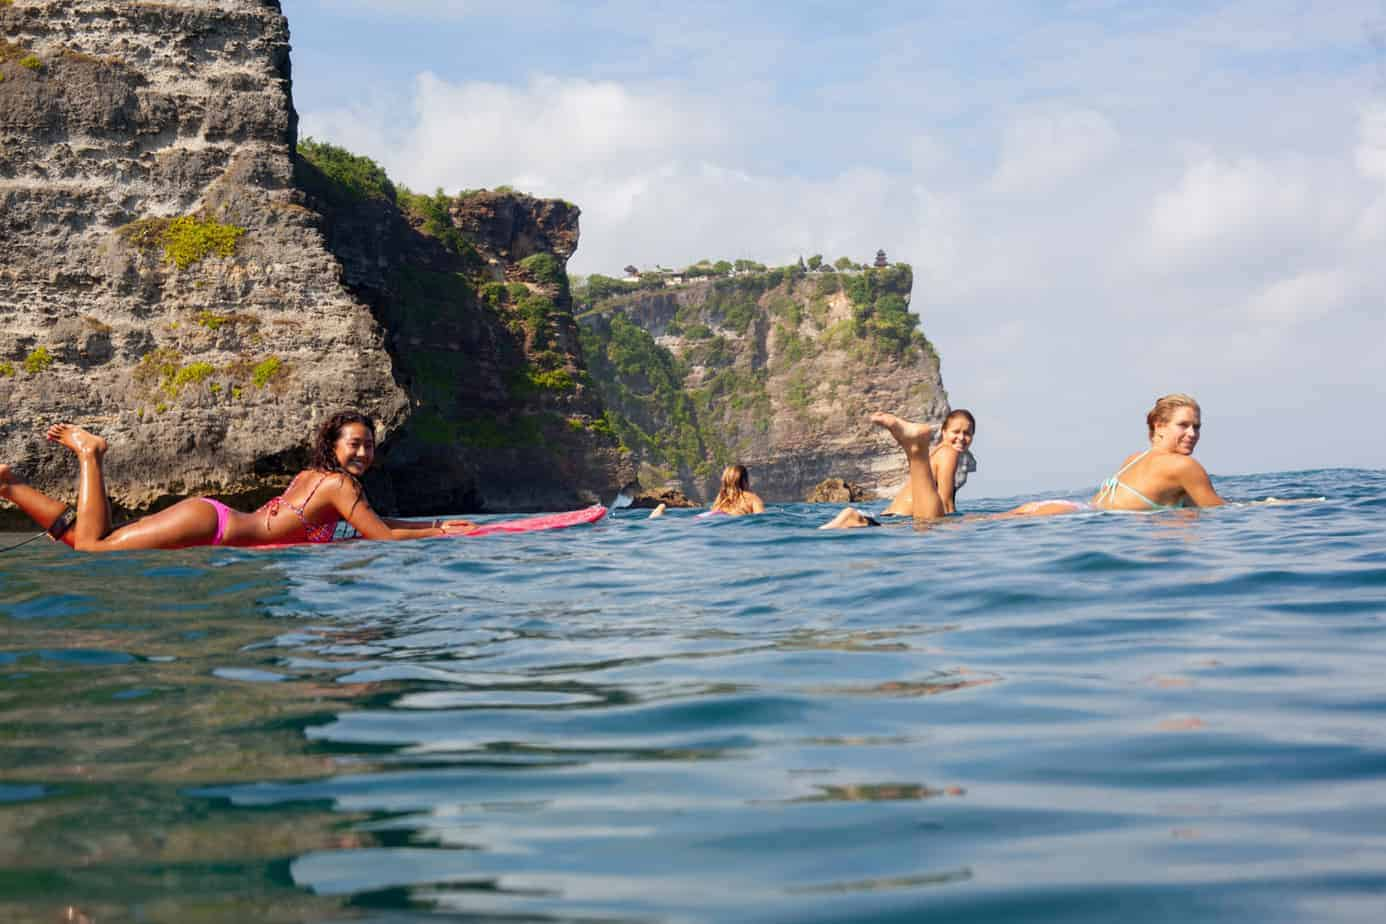 Girls surfing at Uluwatu, Bali, Indonesia